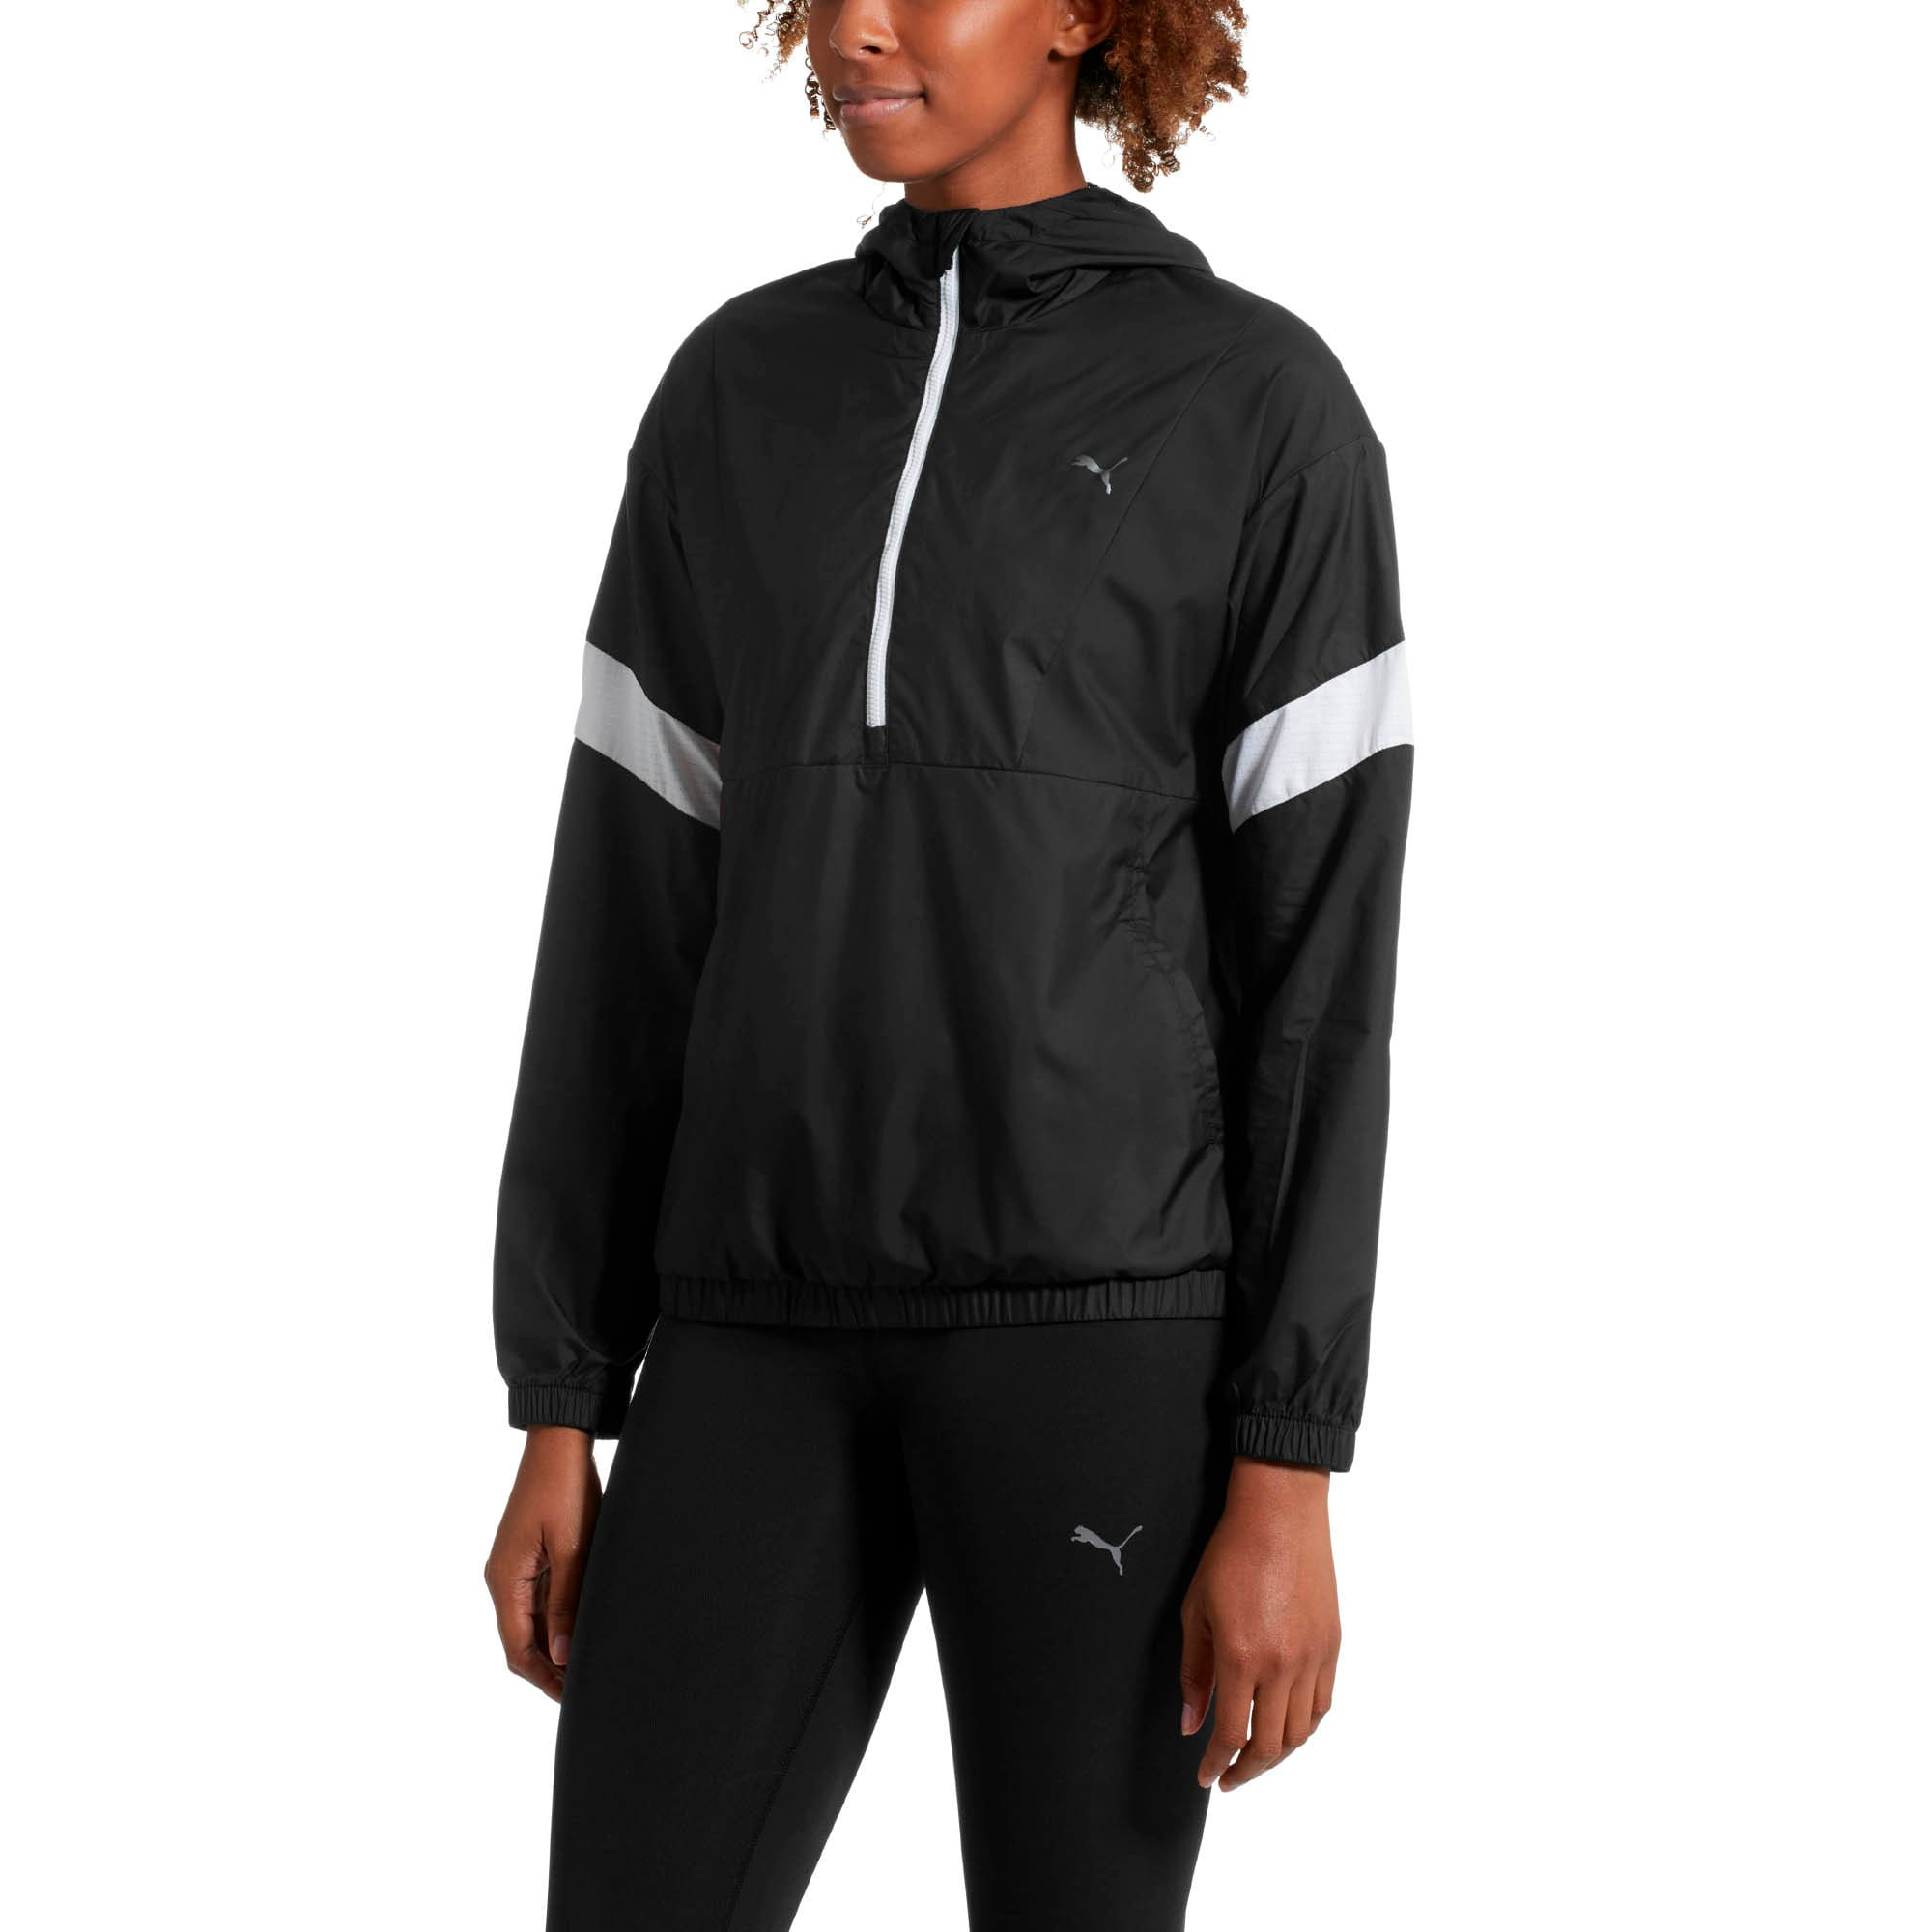 Thumbnail 2 of A.C.E Women's Jacket, Puma Black-Puma White, medium